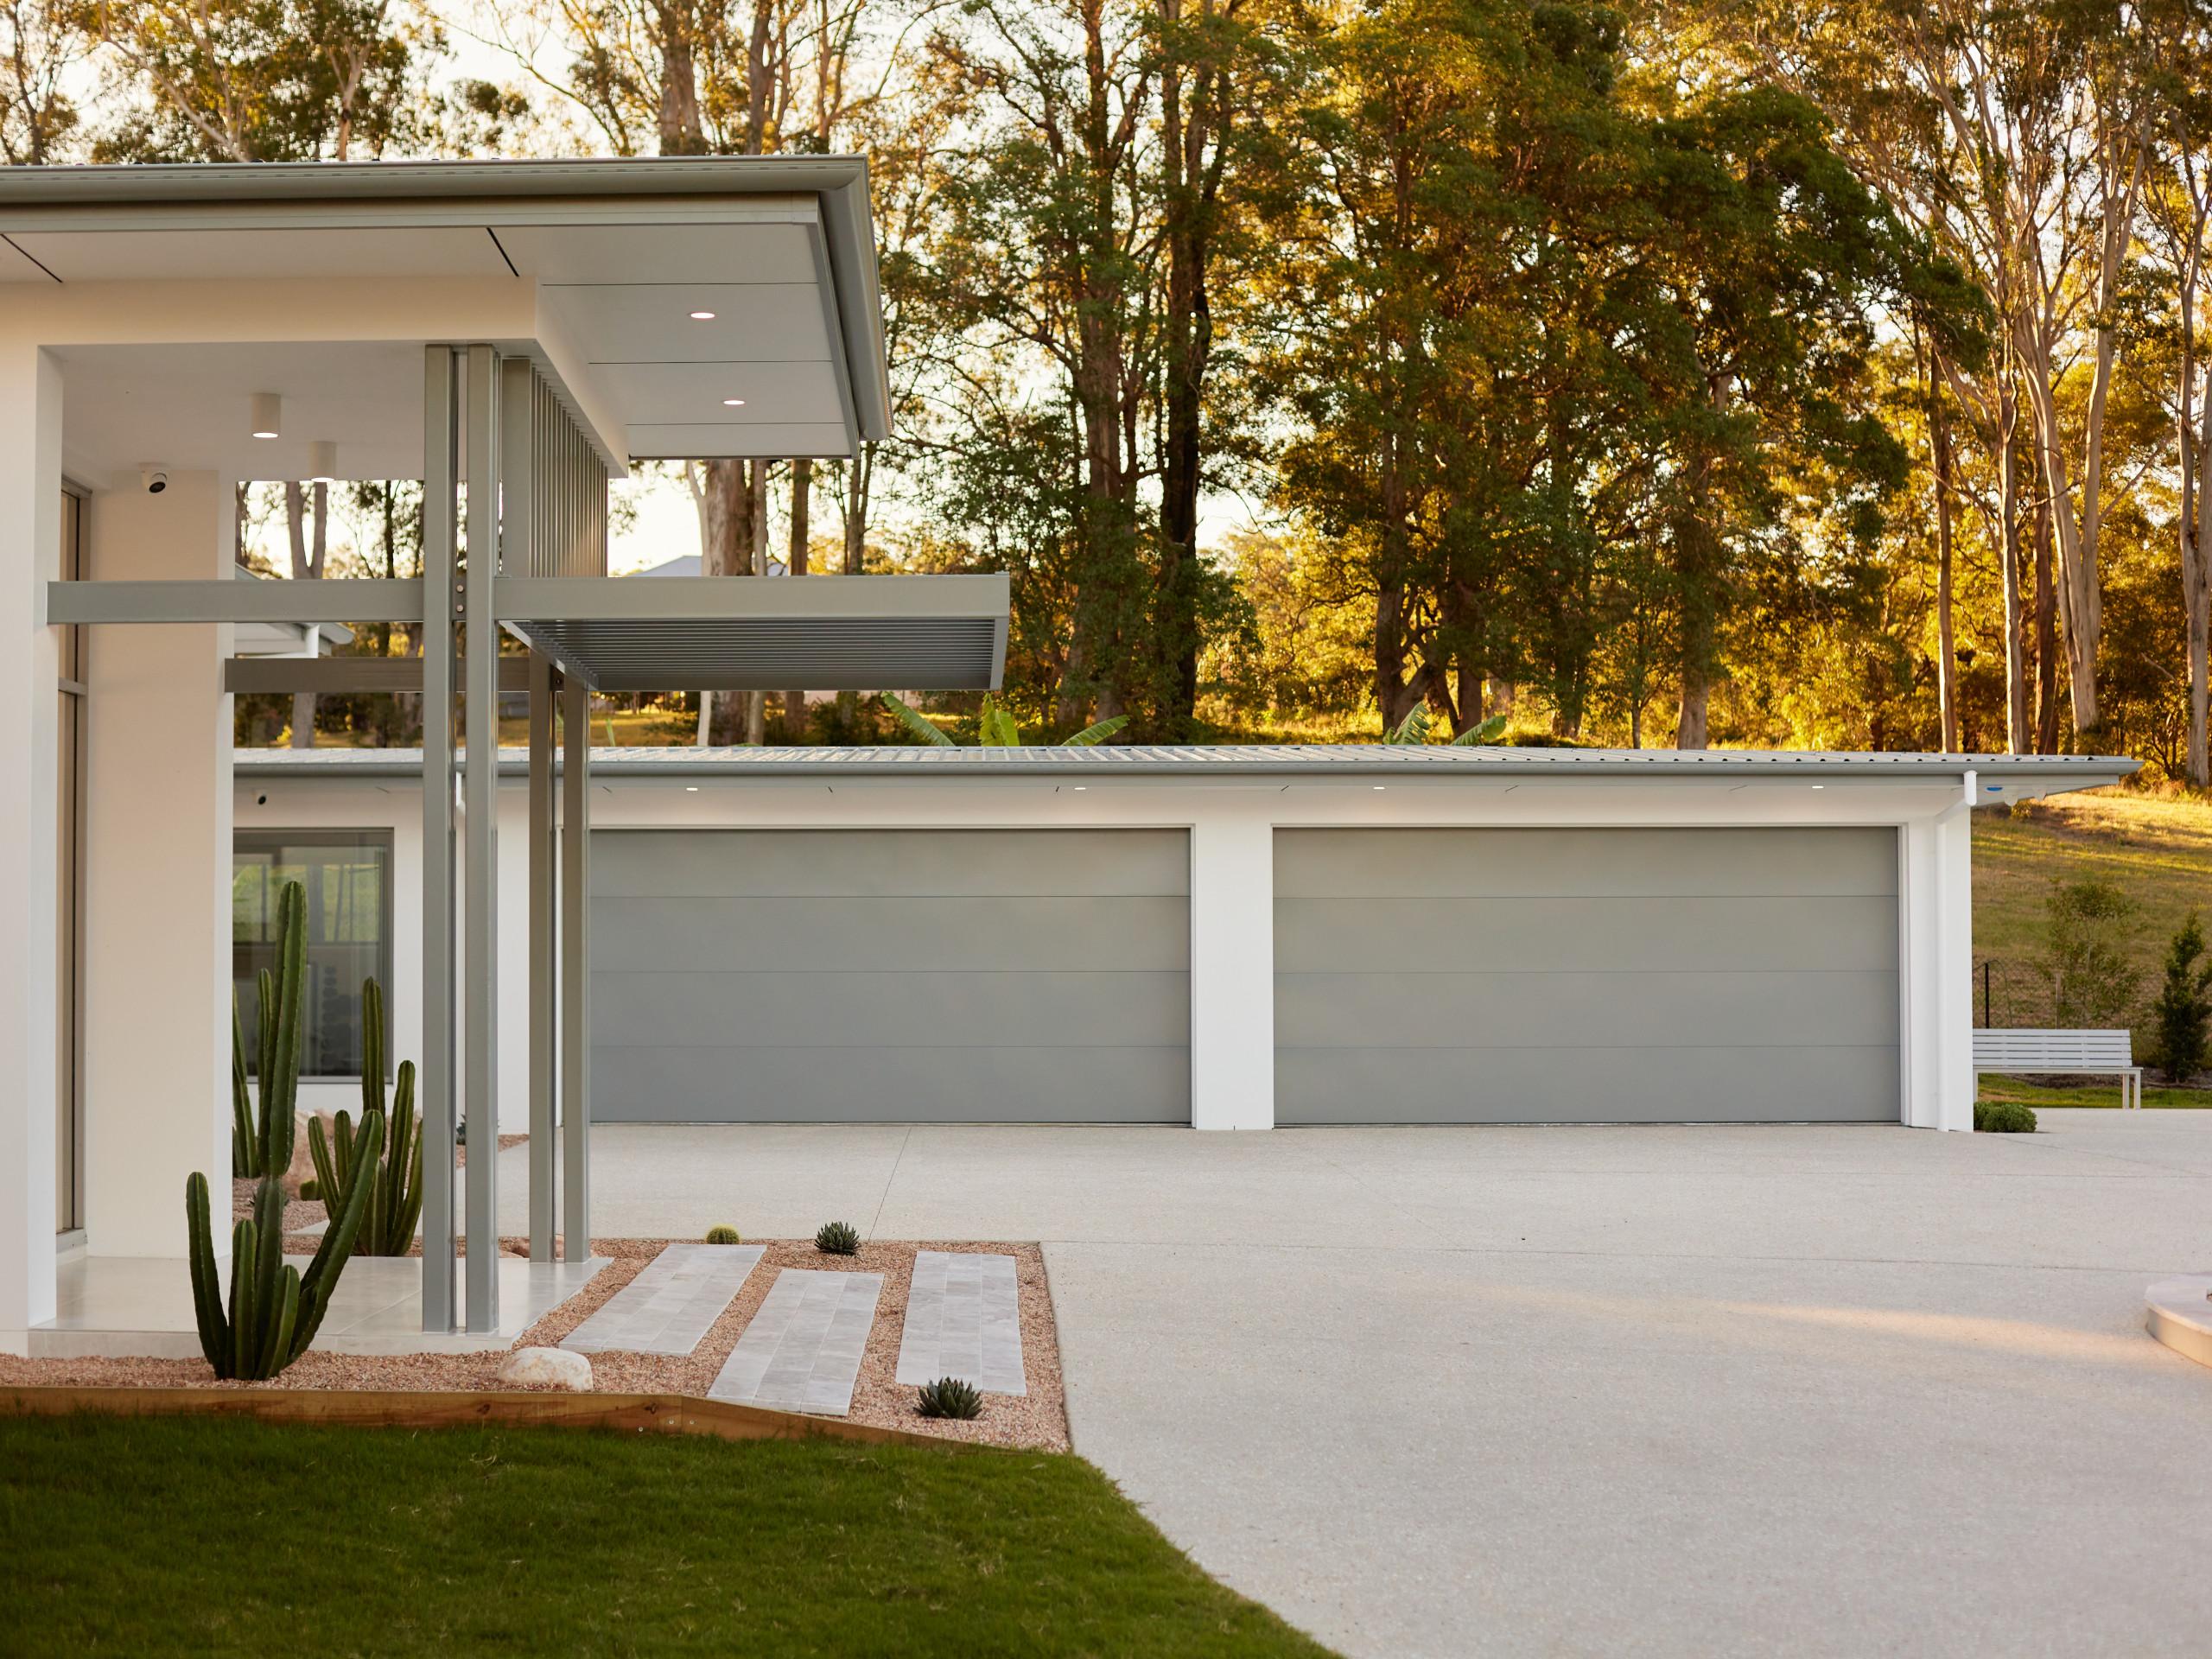 15 Impressive Mid Century Modern Garage Designs For Your New Home